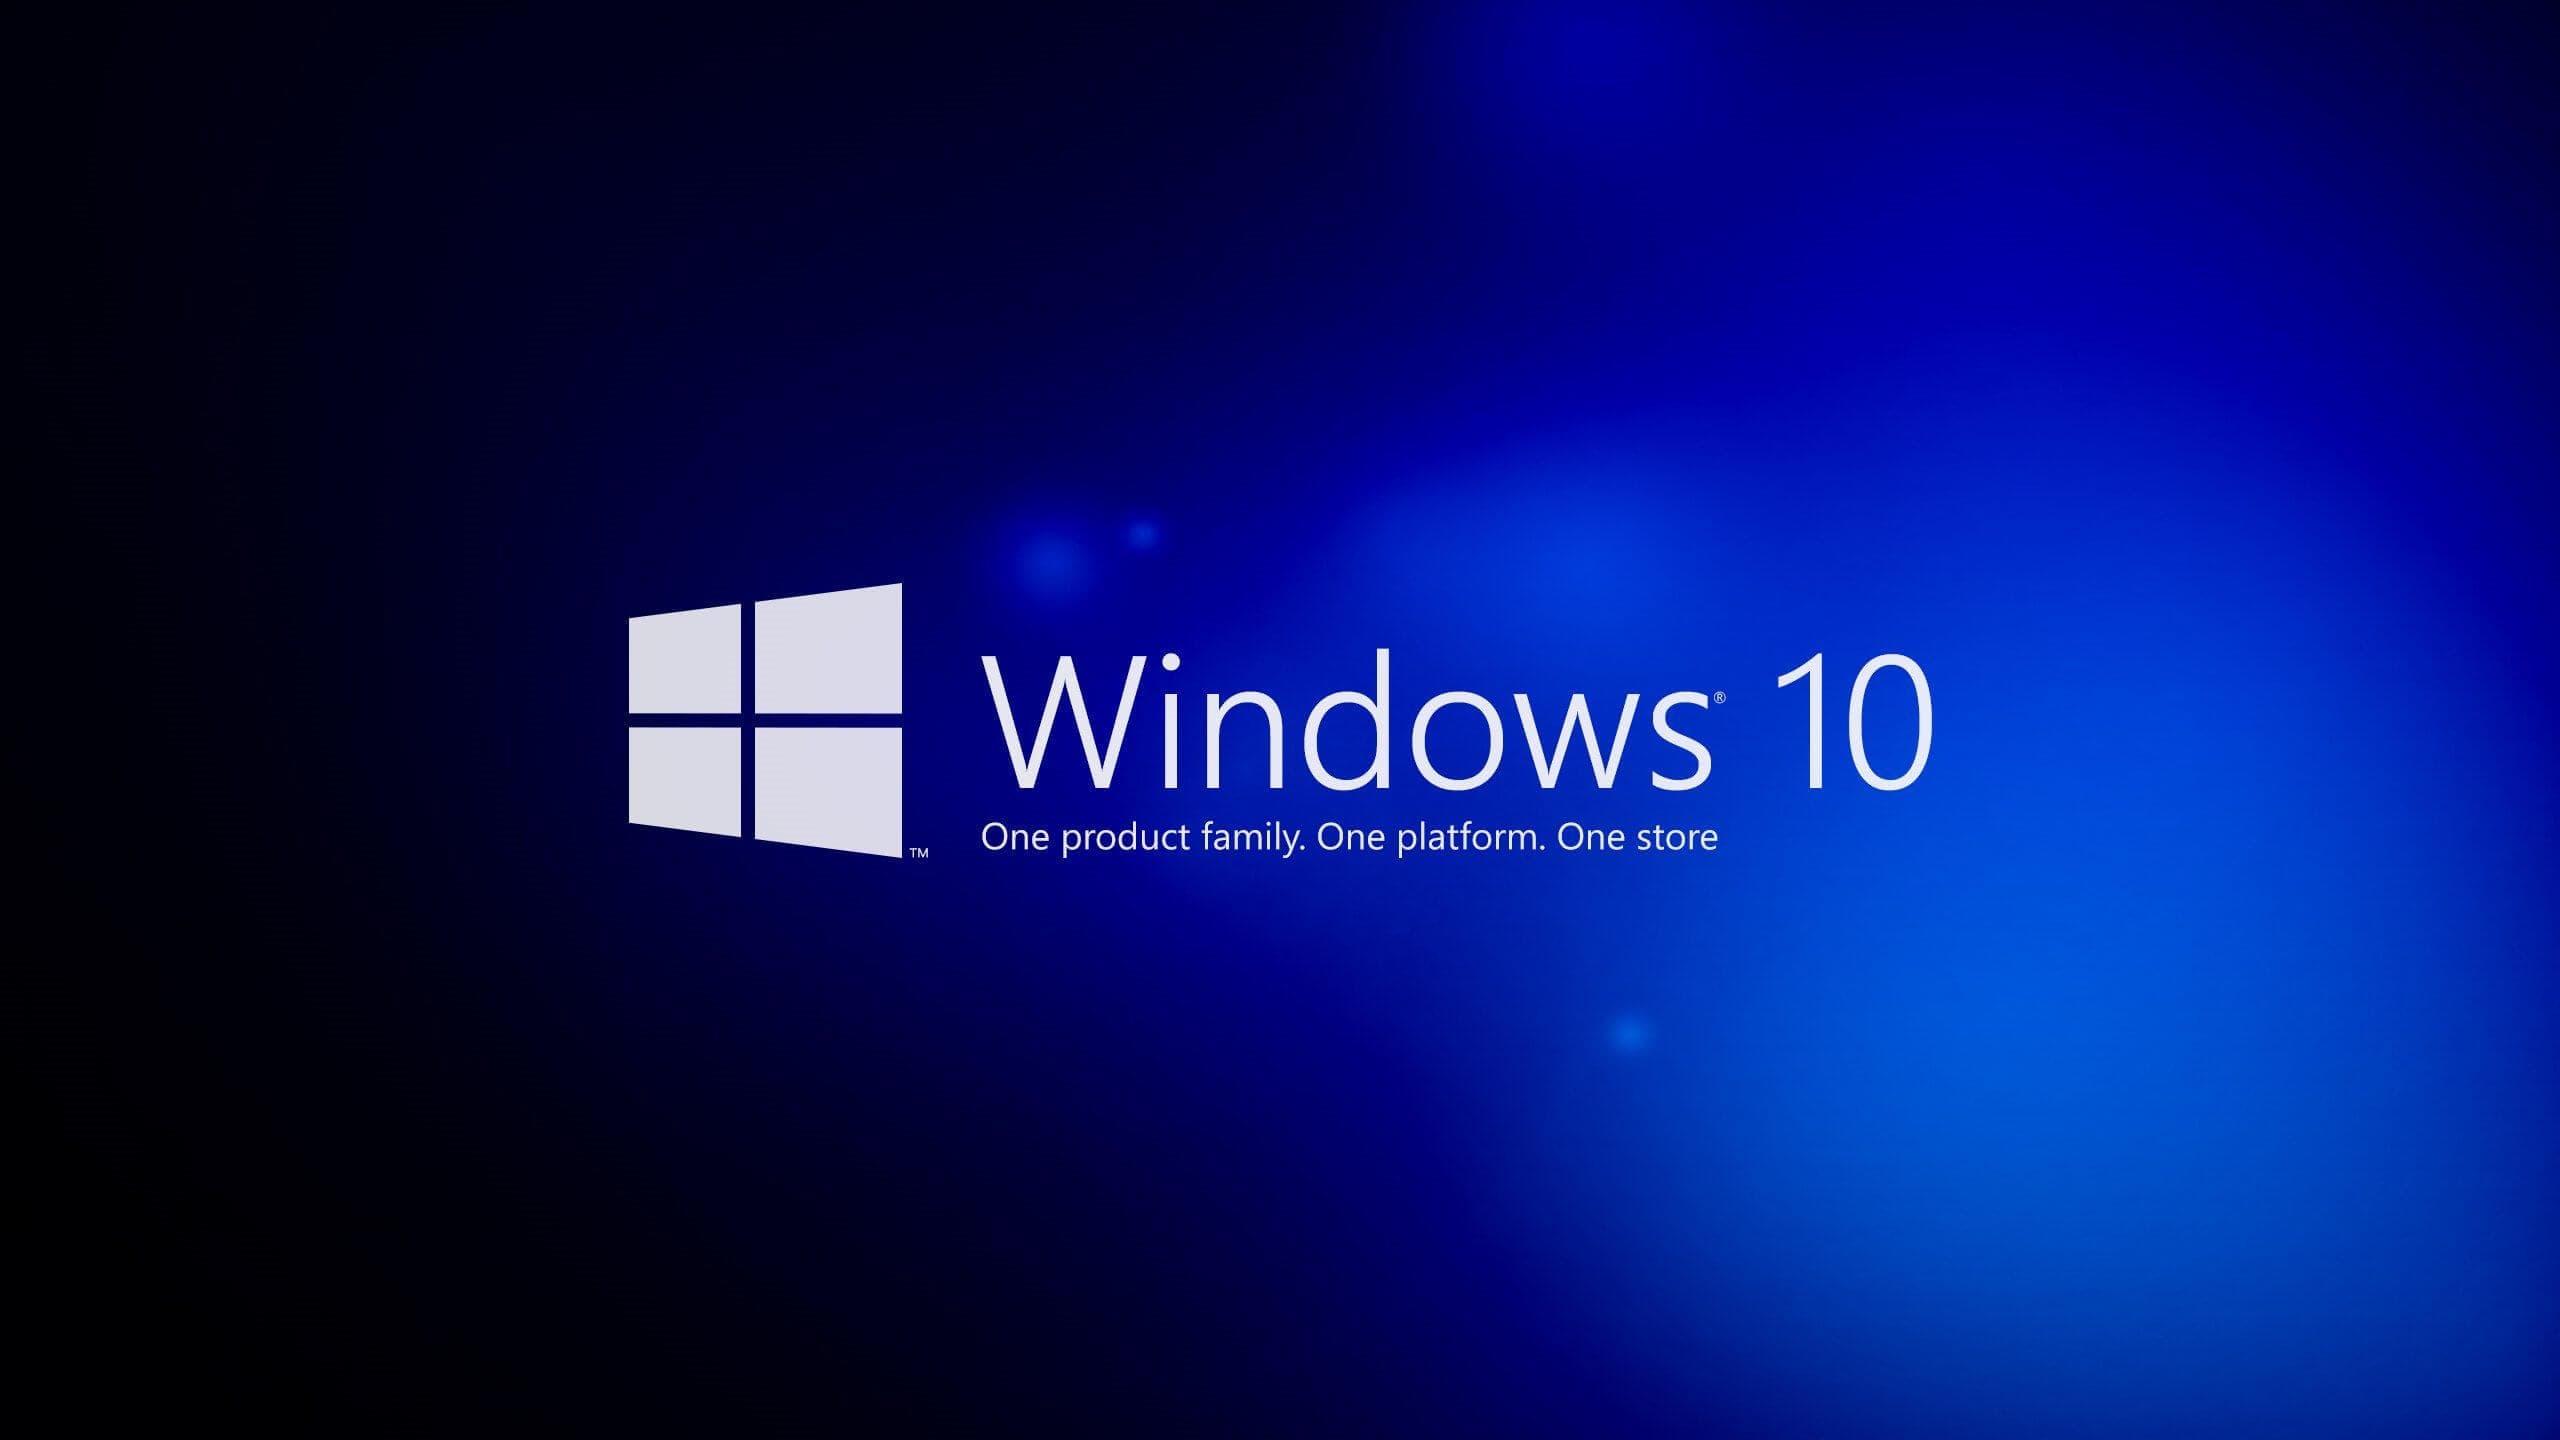 Windows 10 splash